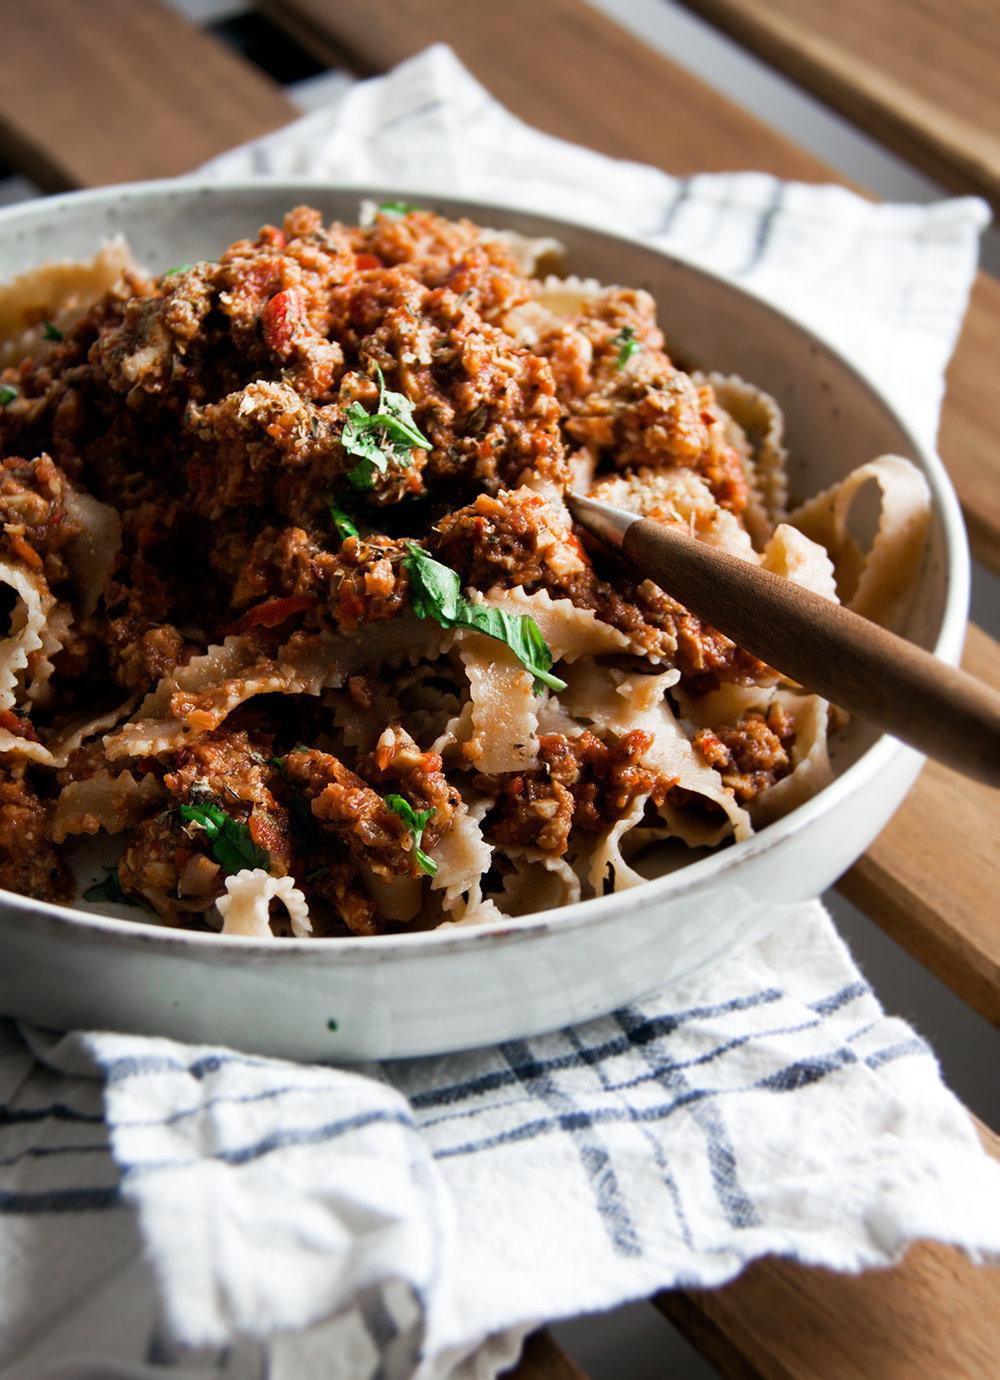 pasta-bolognese-vegan-whole-foods-olievrij.jpg